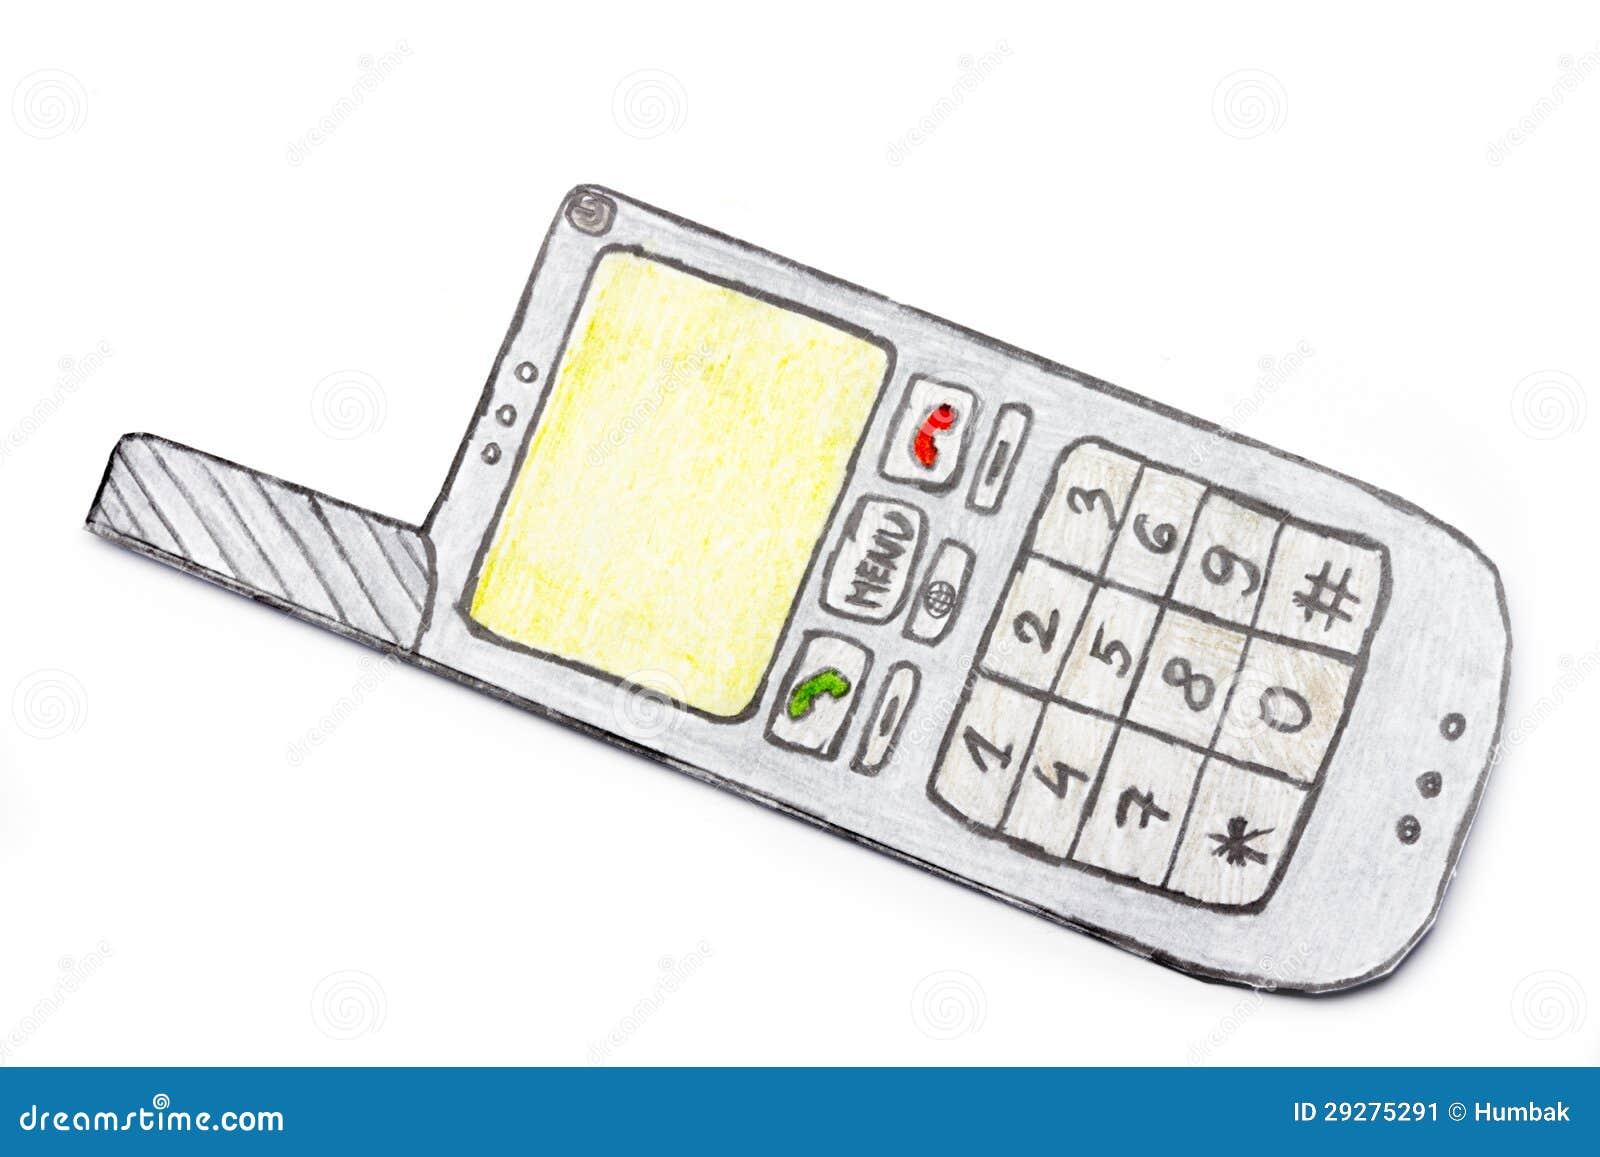 no mobile phones at school essay